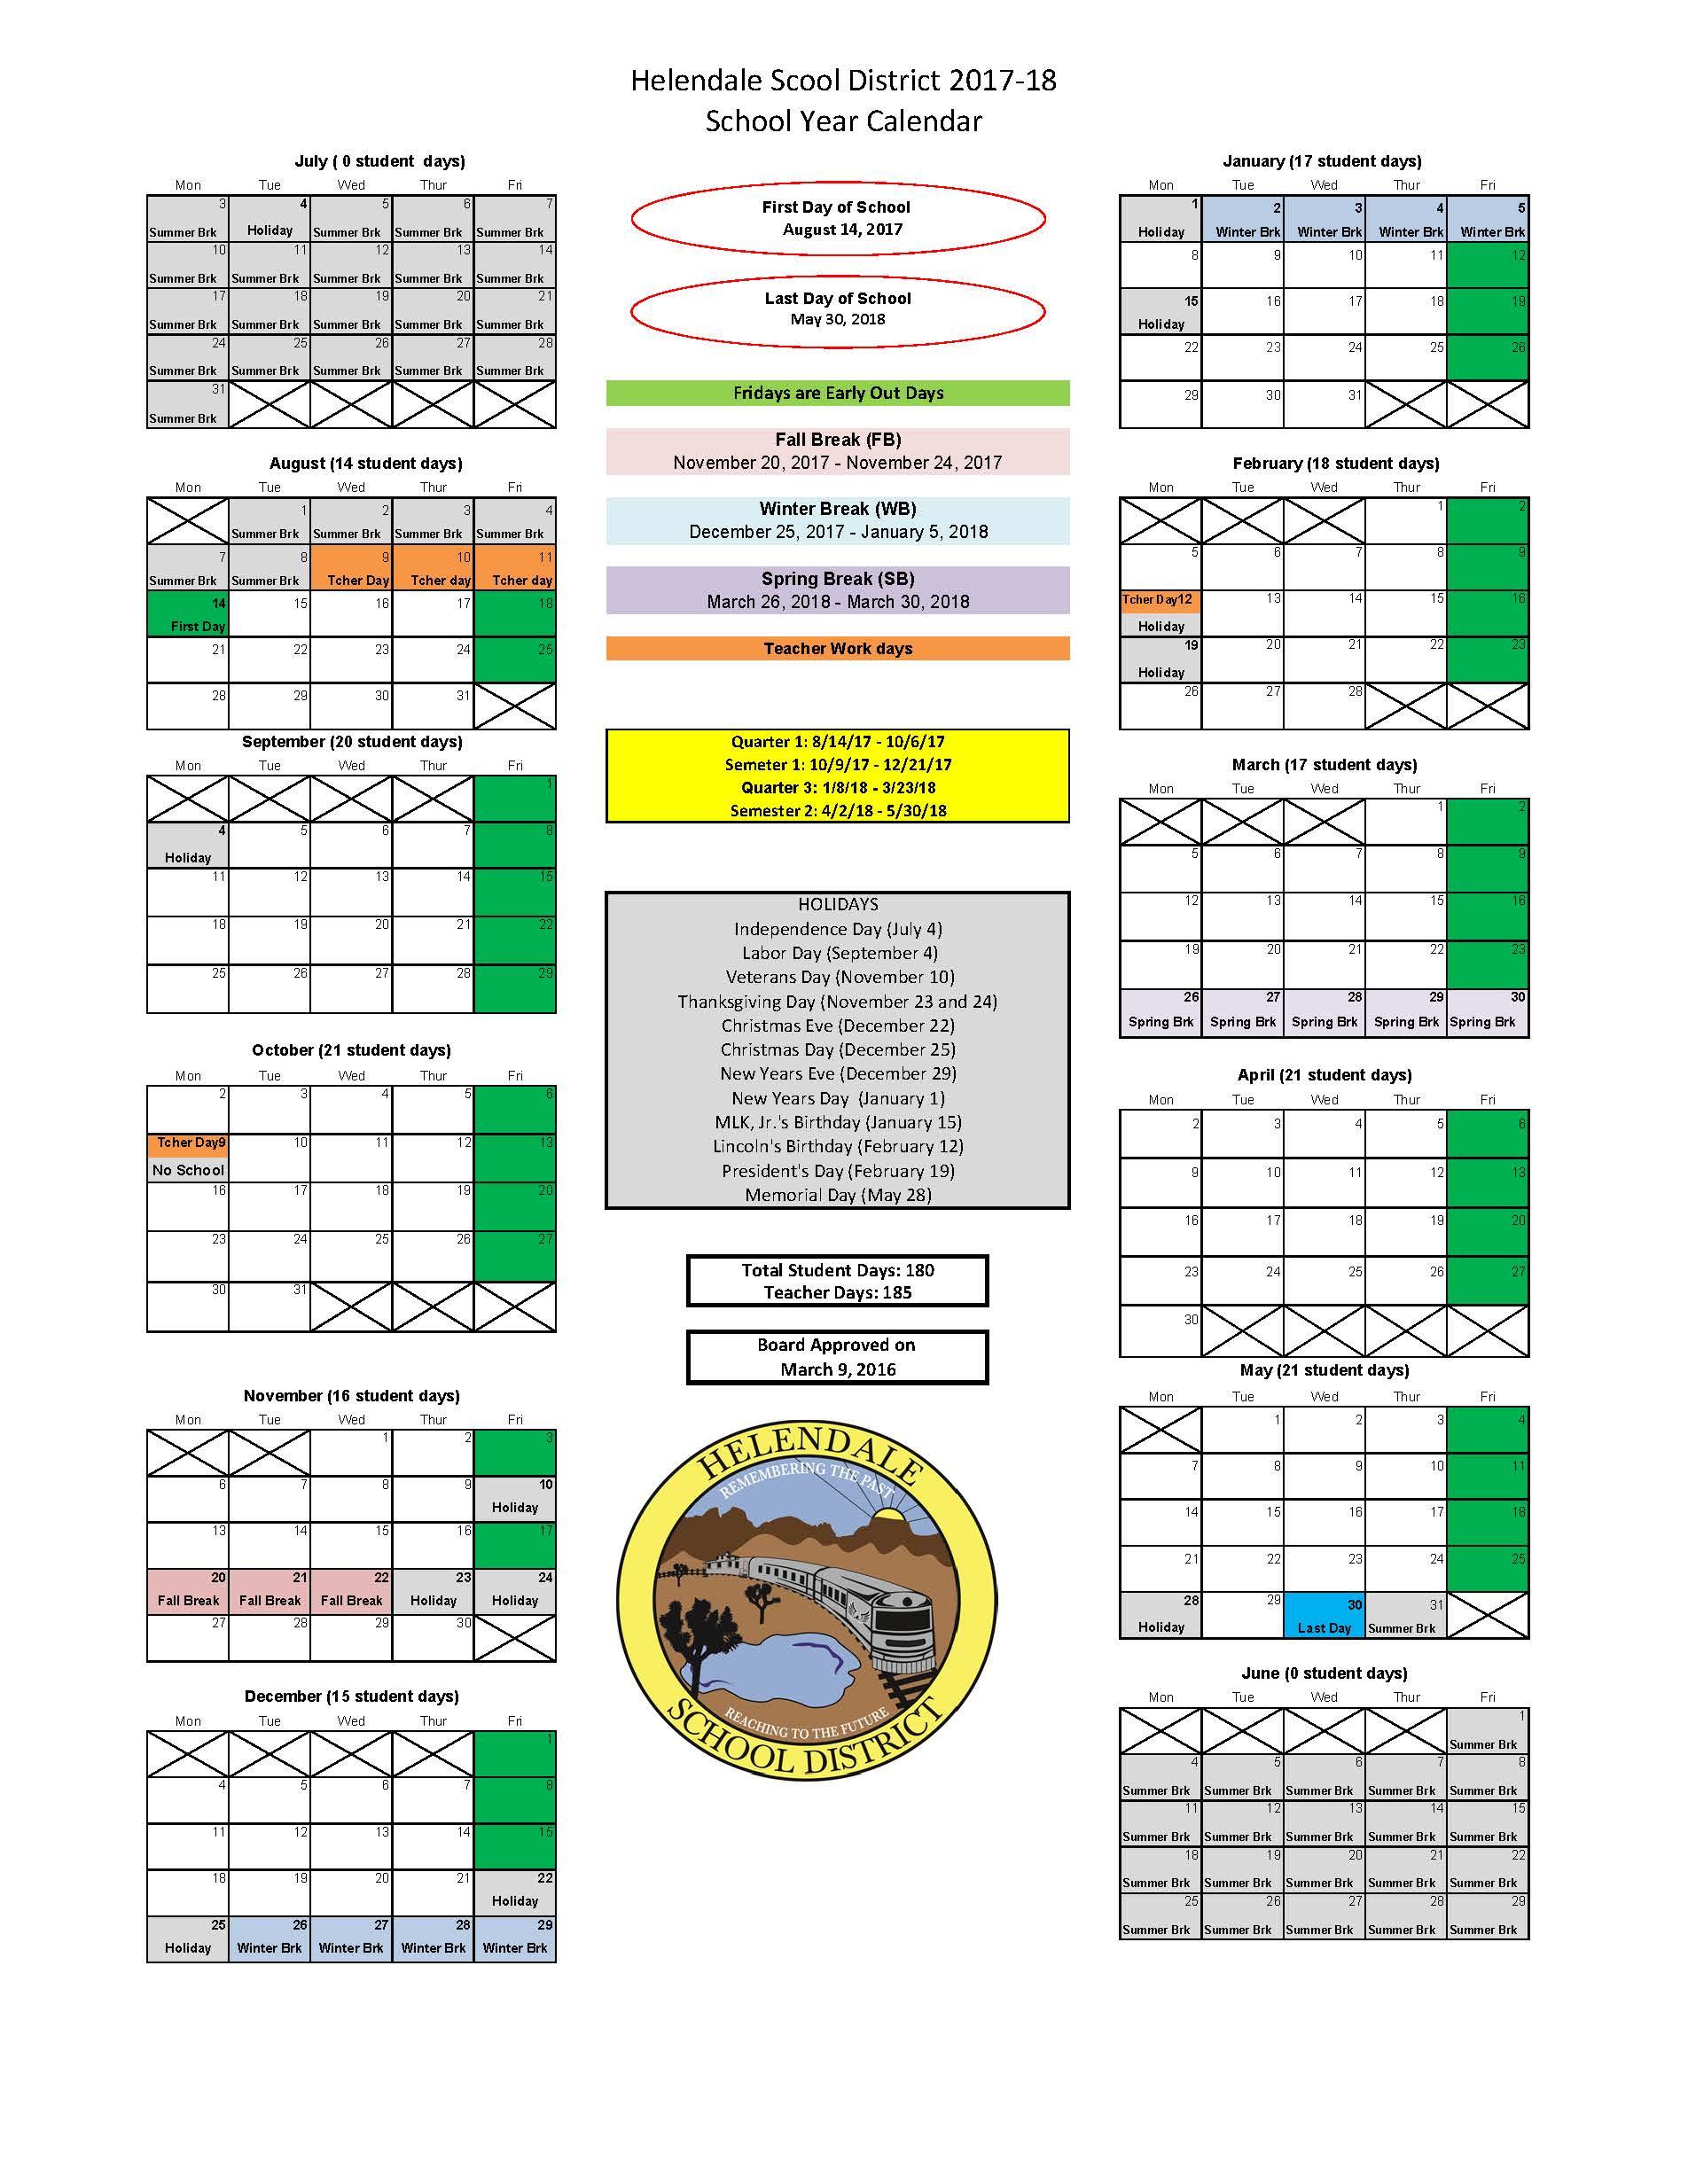 2016-2017; 2017-2018; 2018-19 District Calendar - Helendale in Victorville School District Calendar